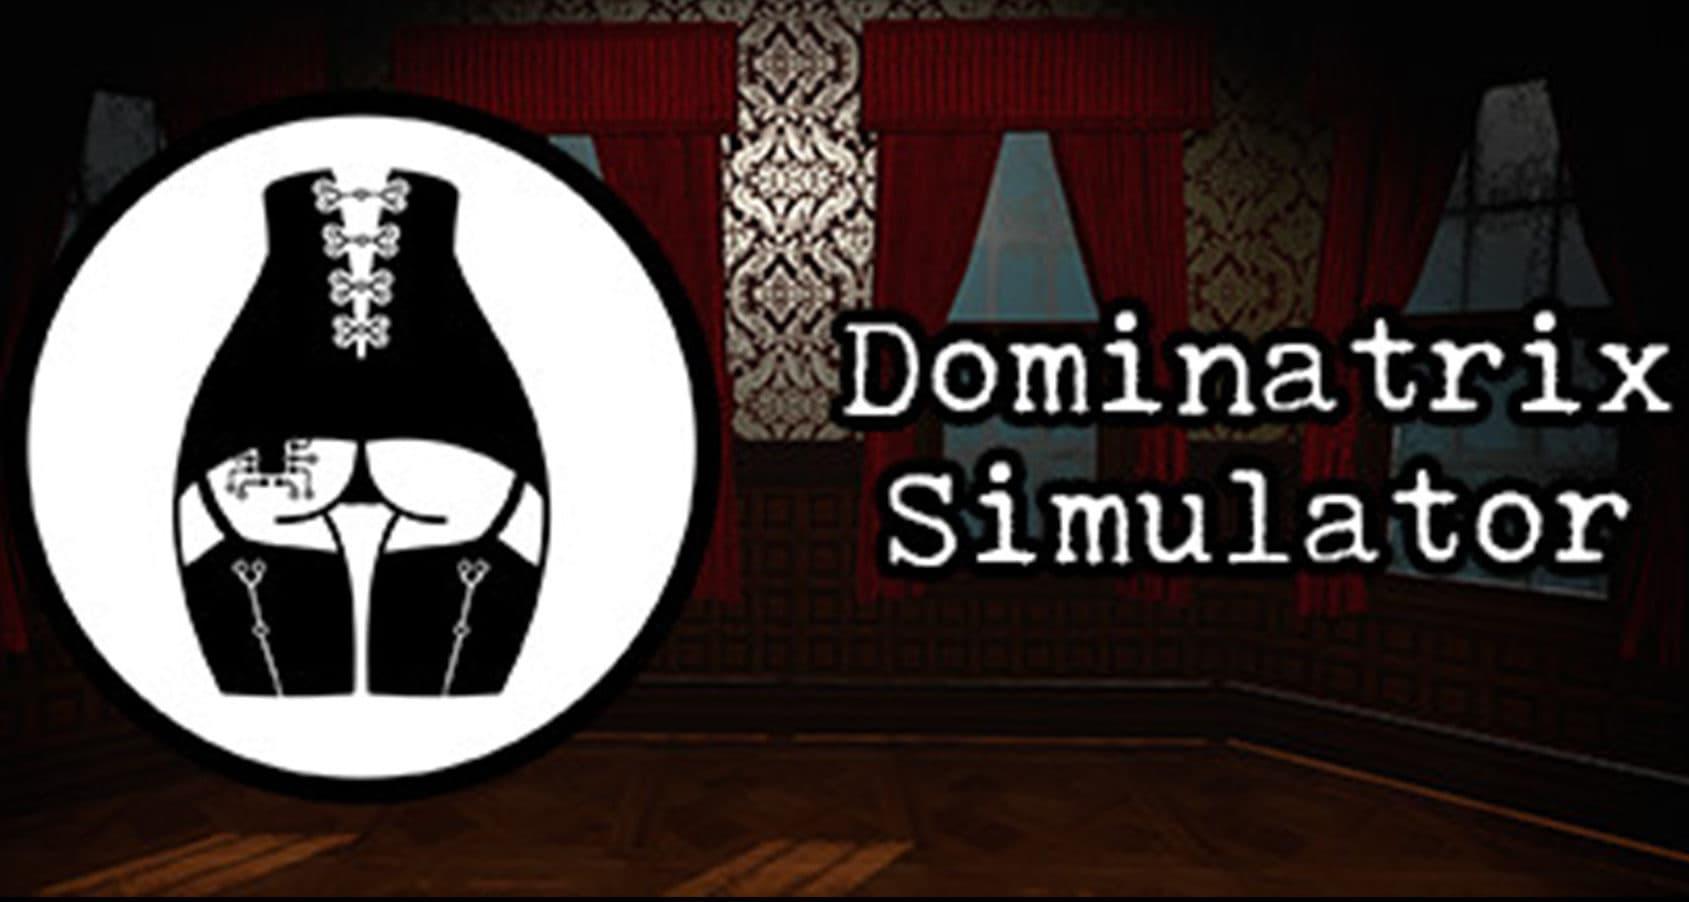 Dominatrix Simulator - VR Porn Game Review cgi lewd vr game